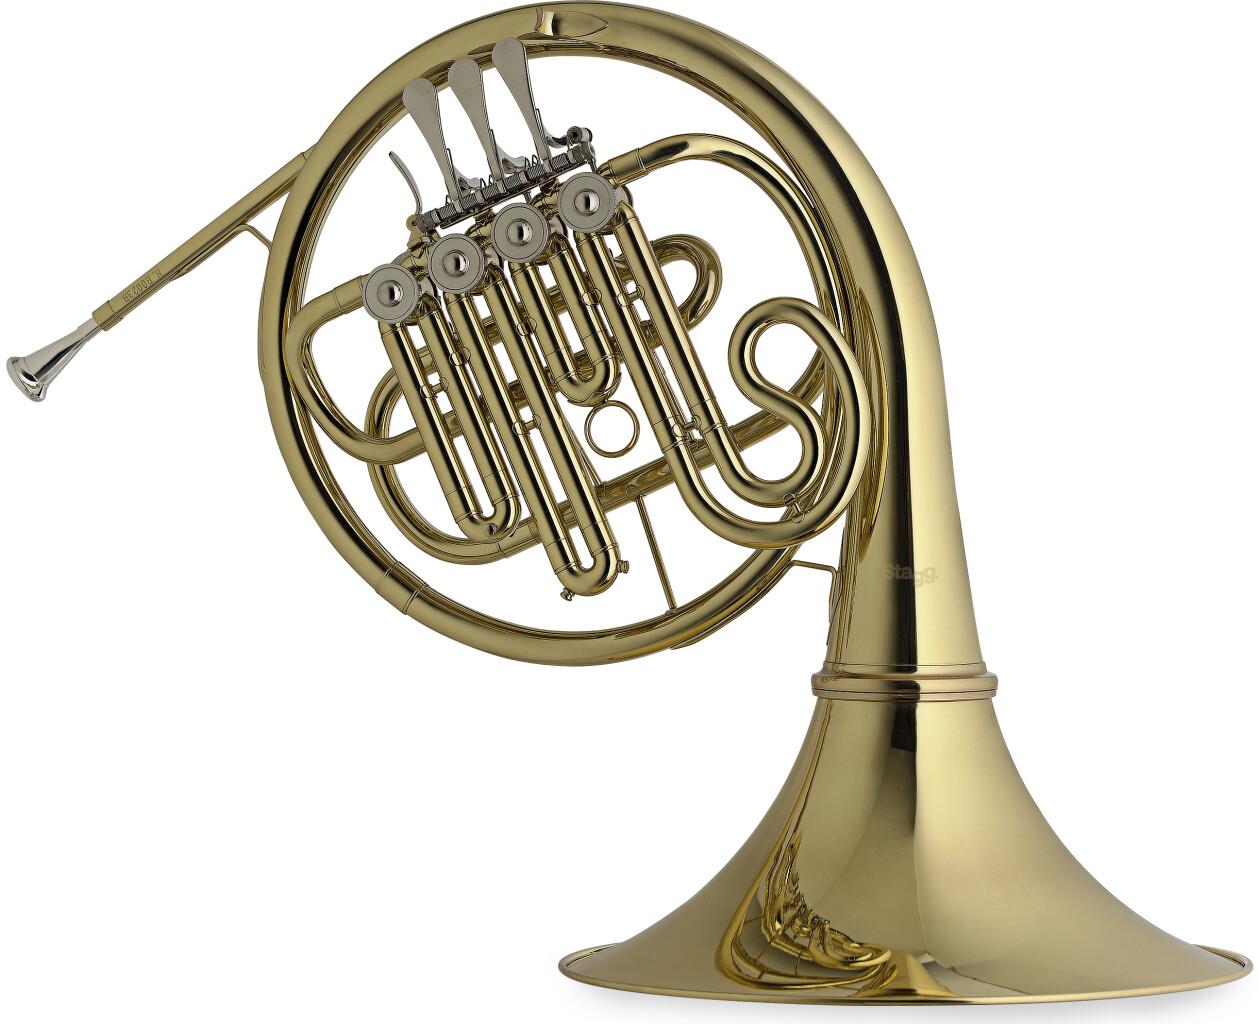 Bb Horn w/A+ valve, 4 rotary valves, body in brass